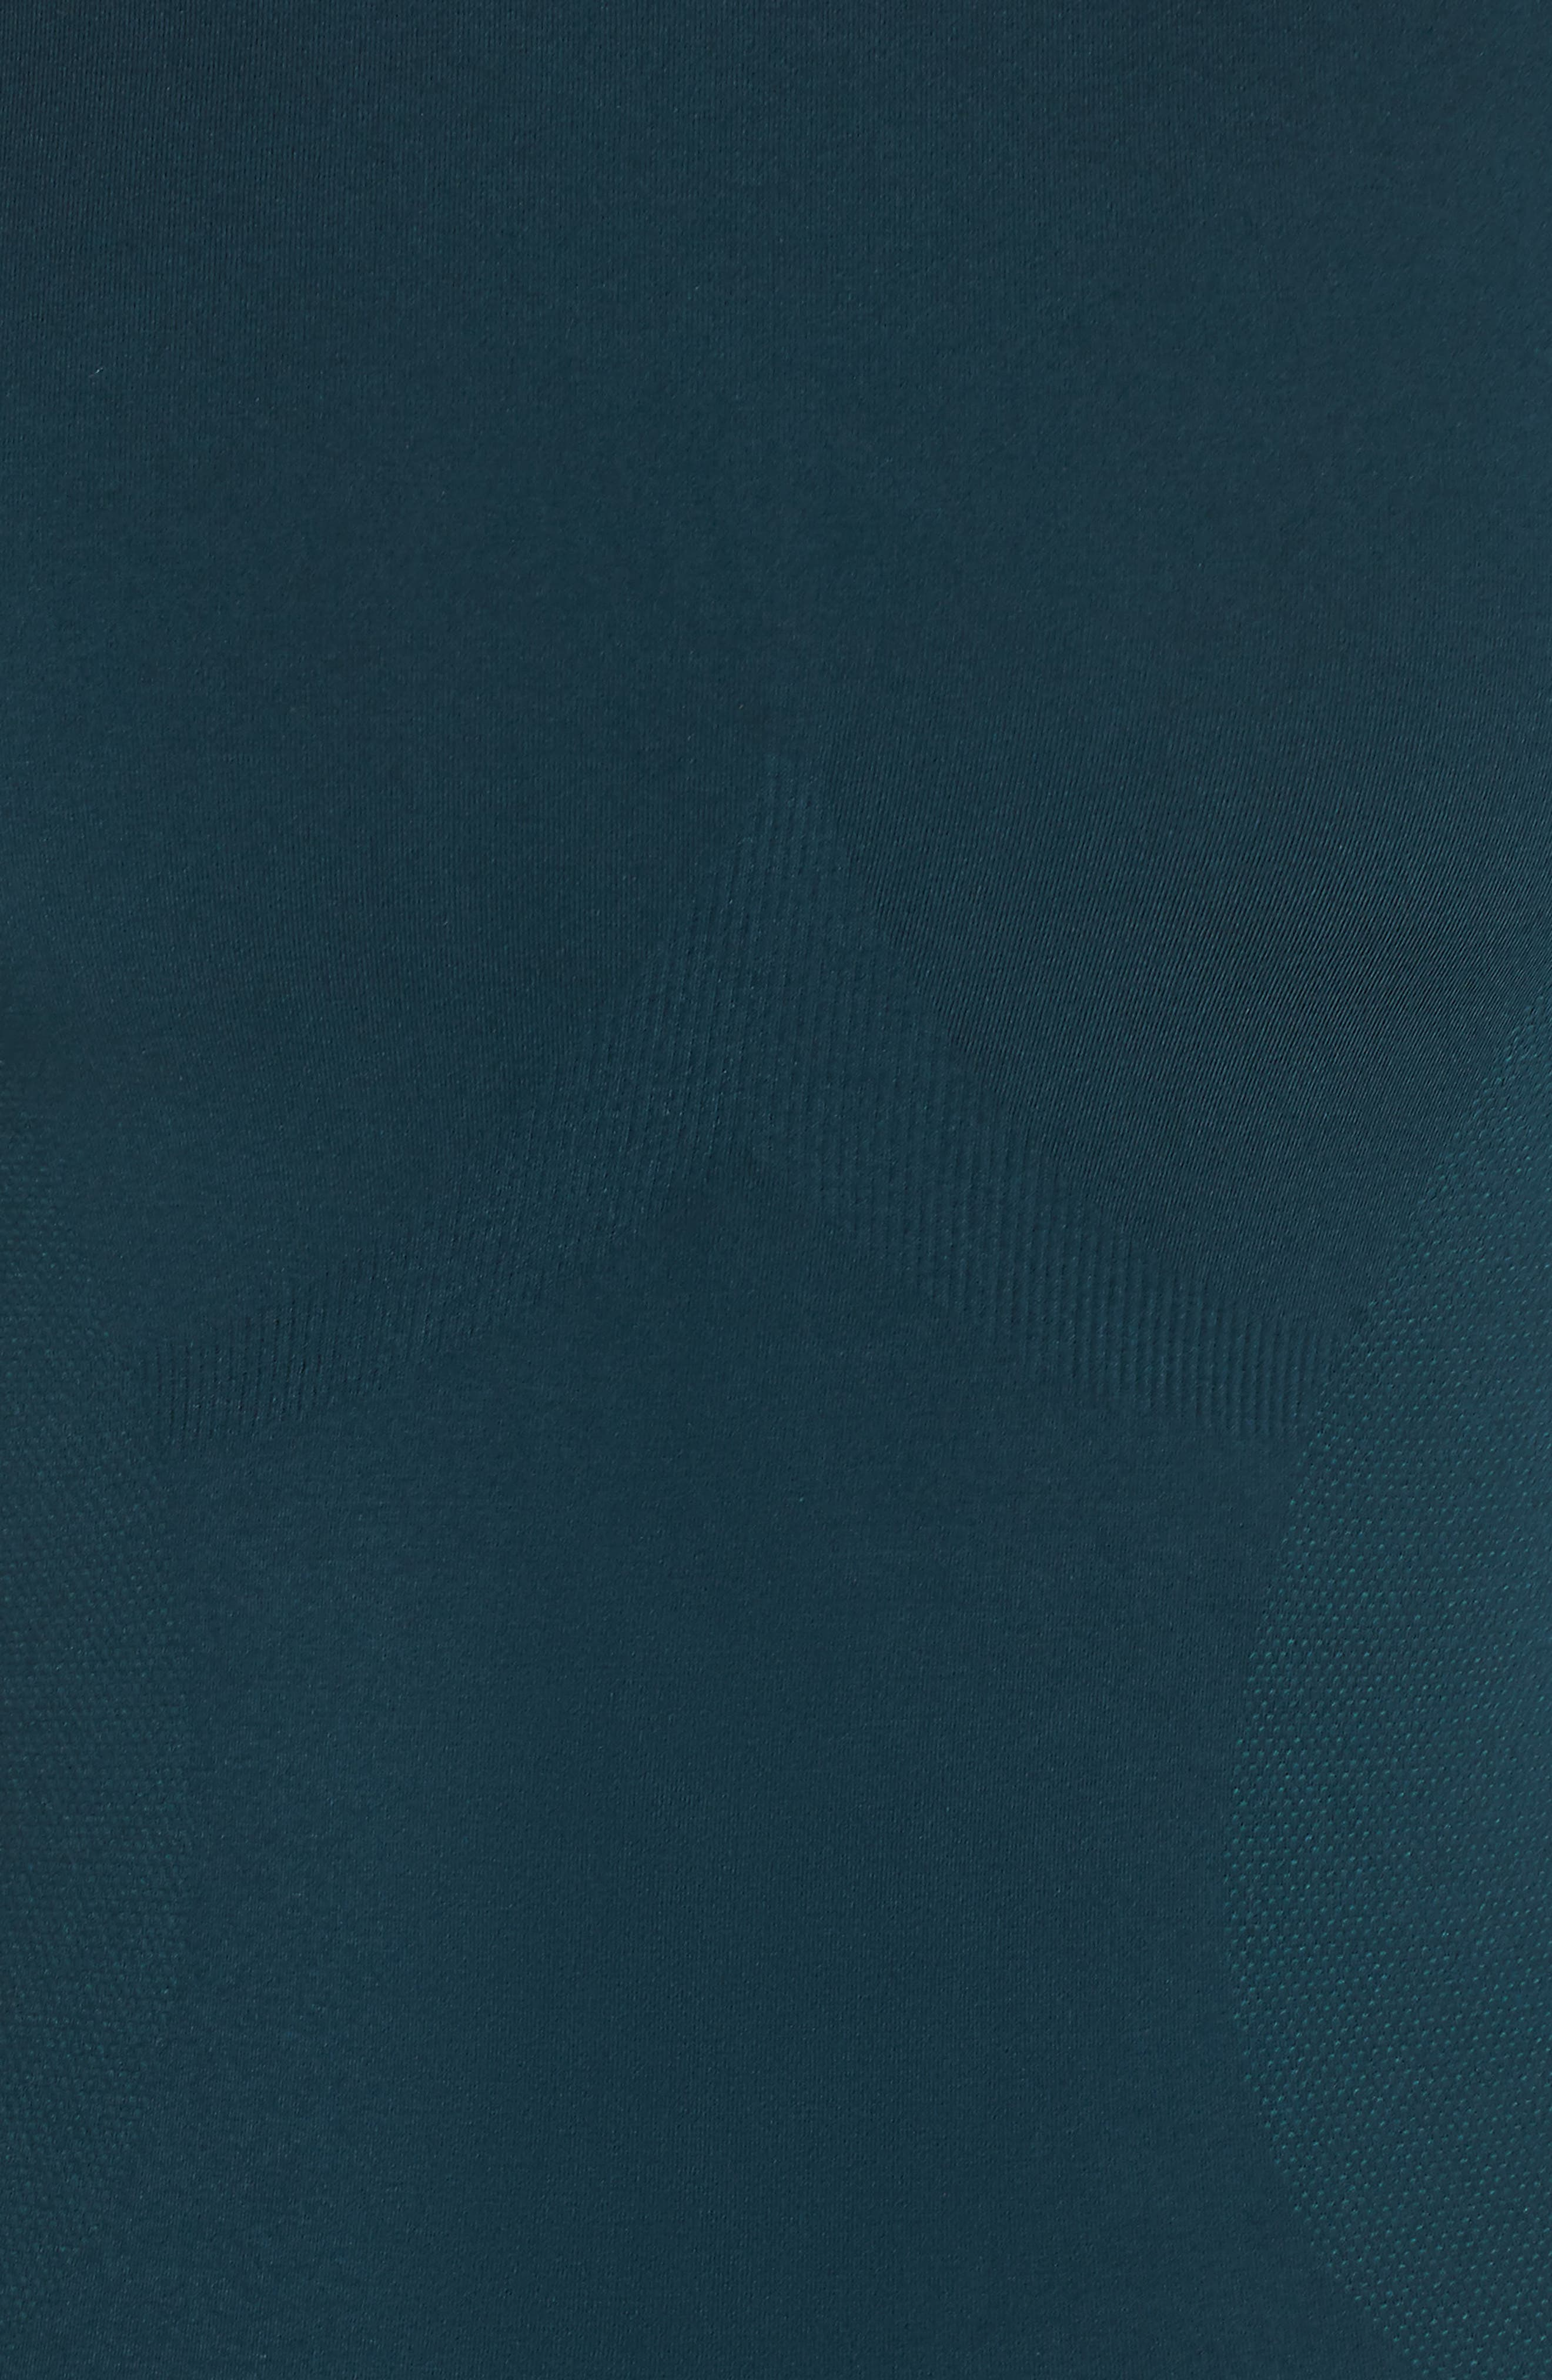 Glisten Long-Sleeve Tee,                             Alternate thumbnail 6, color,                             MIDNIGHT TEAL